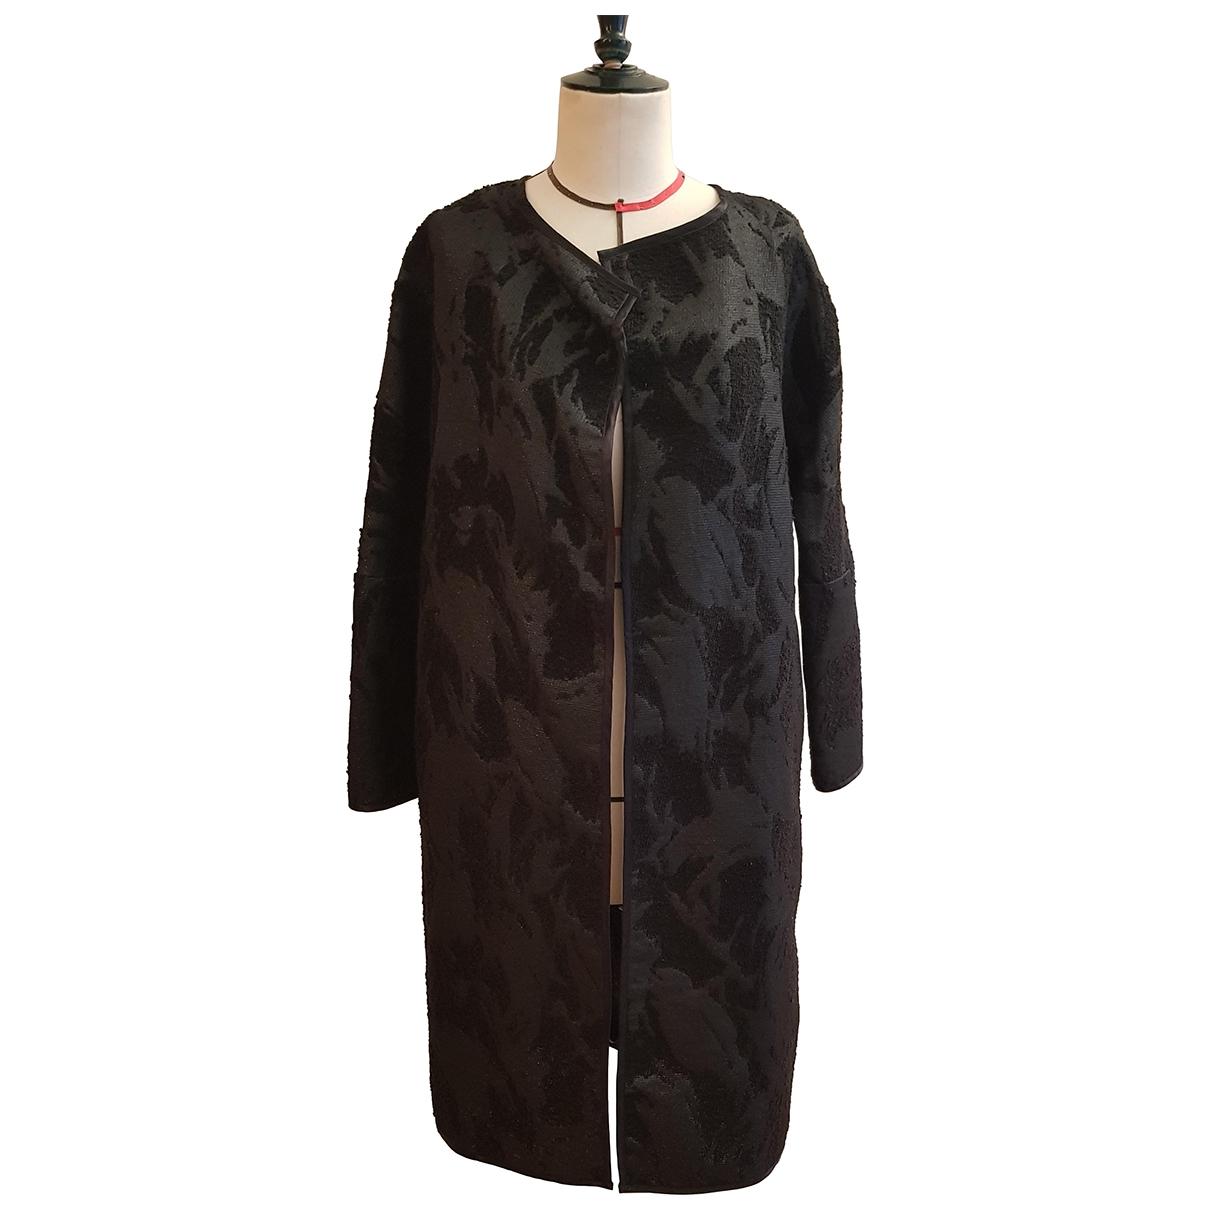 By Malene Birger \N Black Cotton coat for Women 38 FR